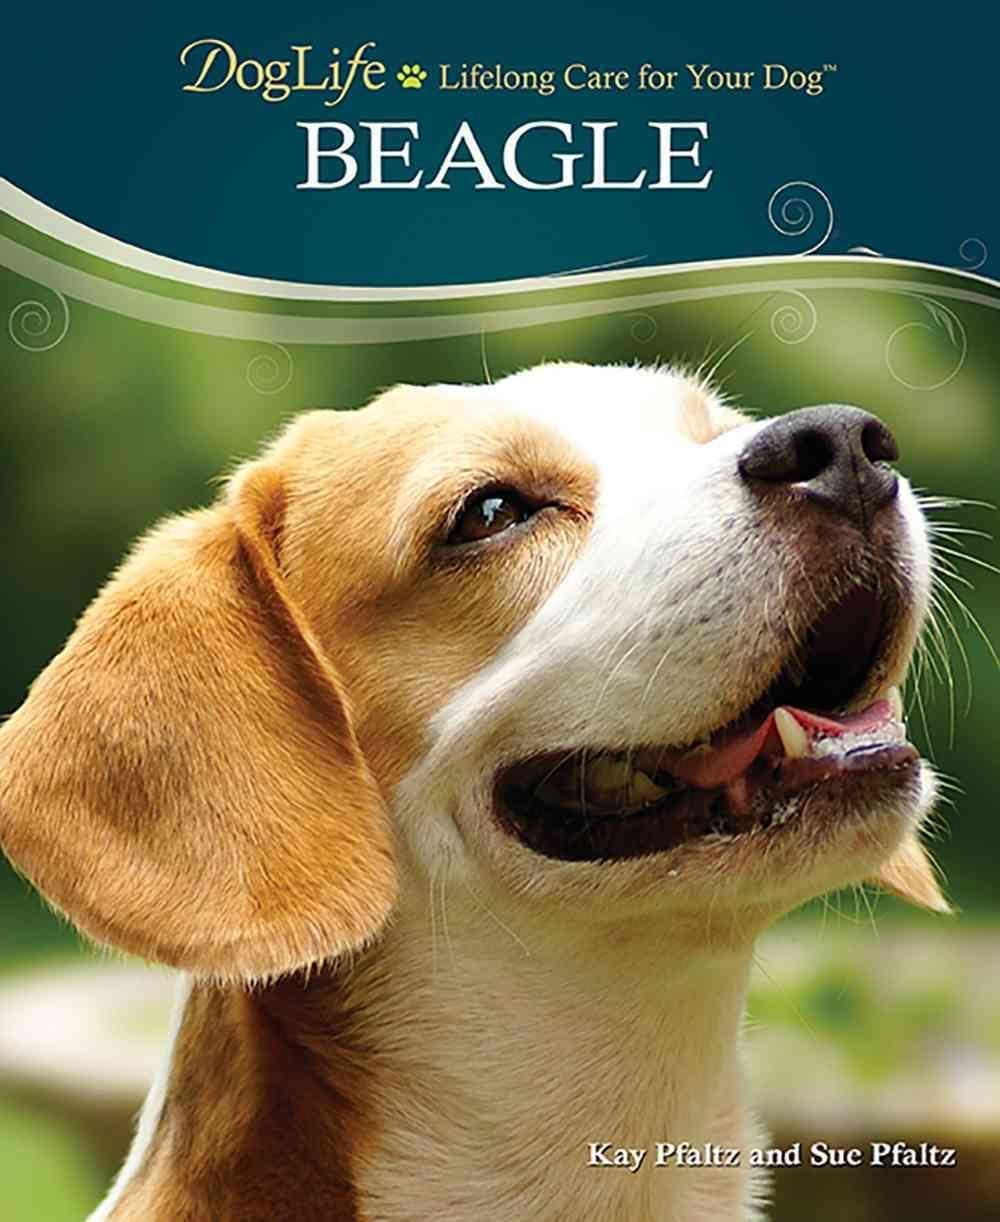 Presents An Introduction To Beagles Describing Their Physical